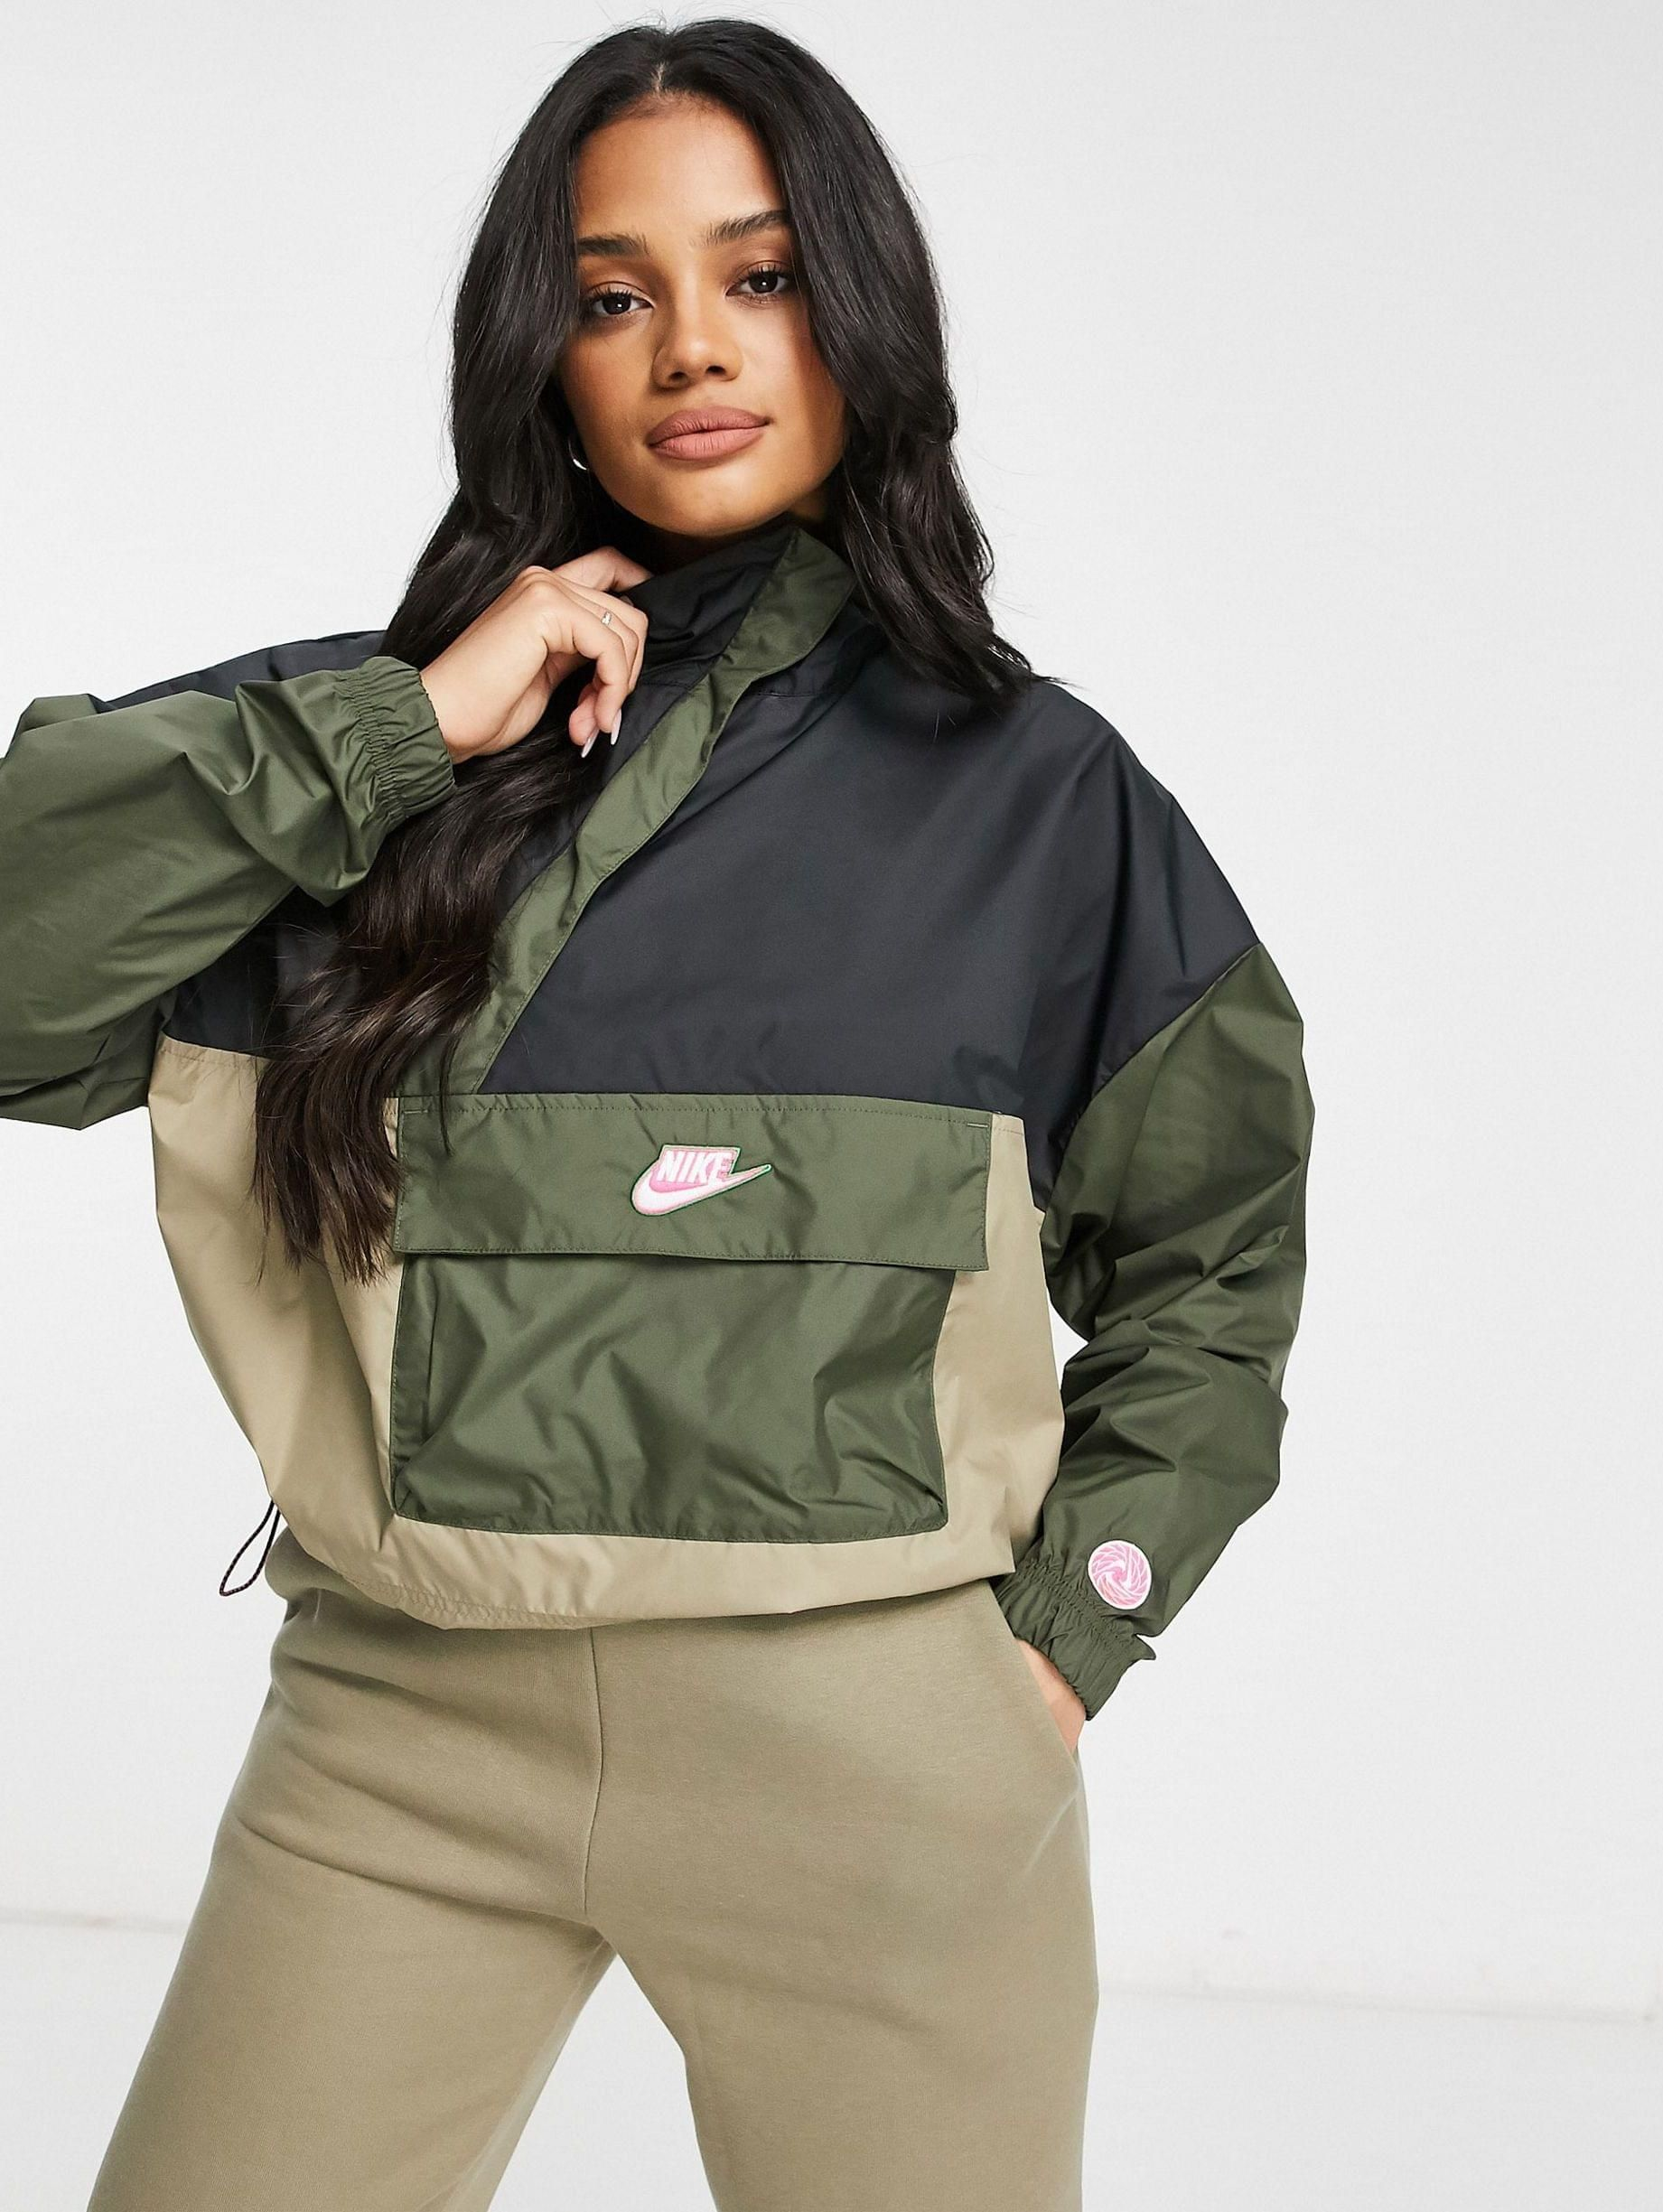 Women Nike Color Block Cropped Overhead Jacket In Khaki And Black 100 Nike Women Jackets Color Block [ 2449 x 1841 Pixel ]